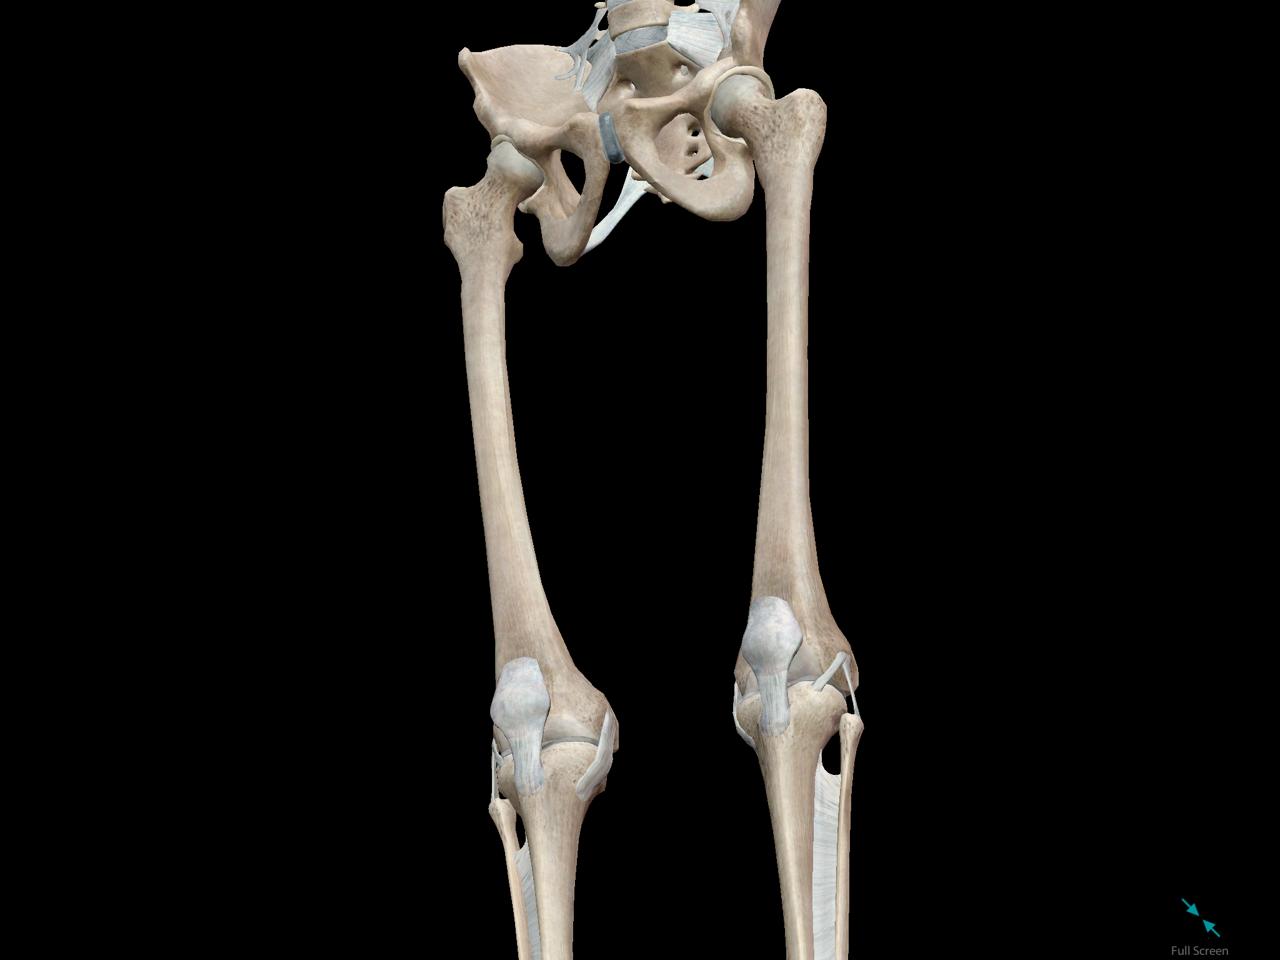 femur-long-bone-compact-osteon-marrow.png